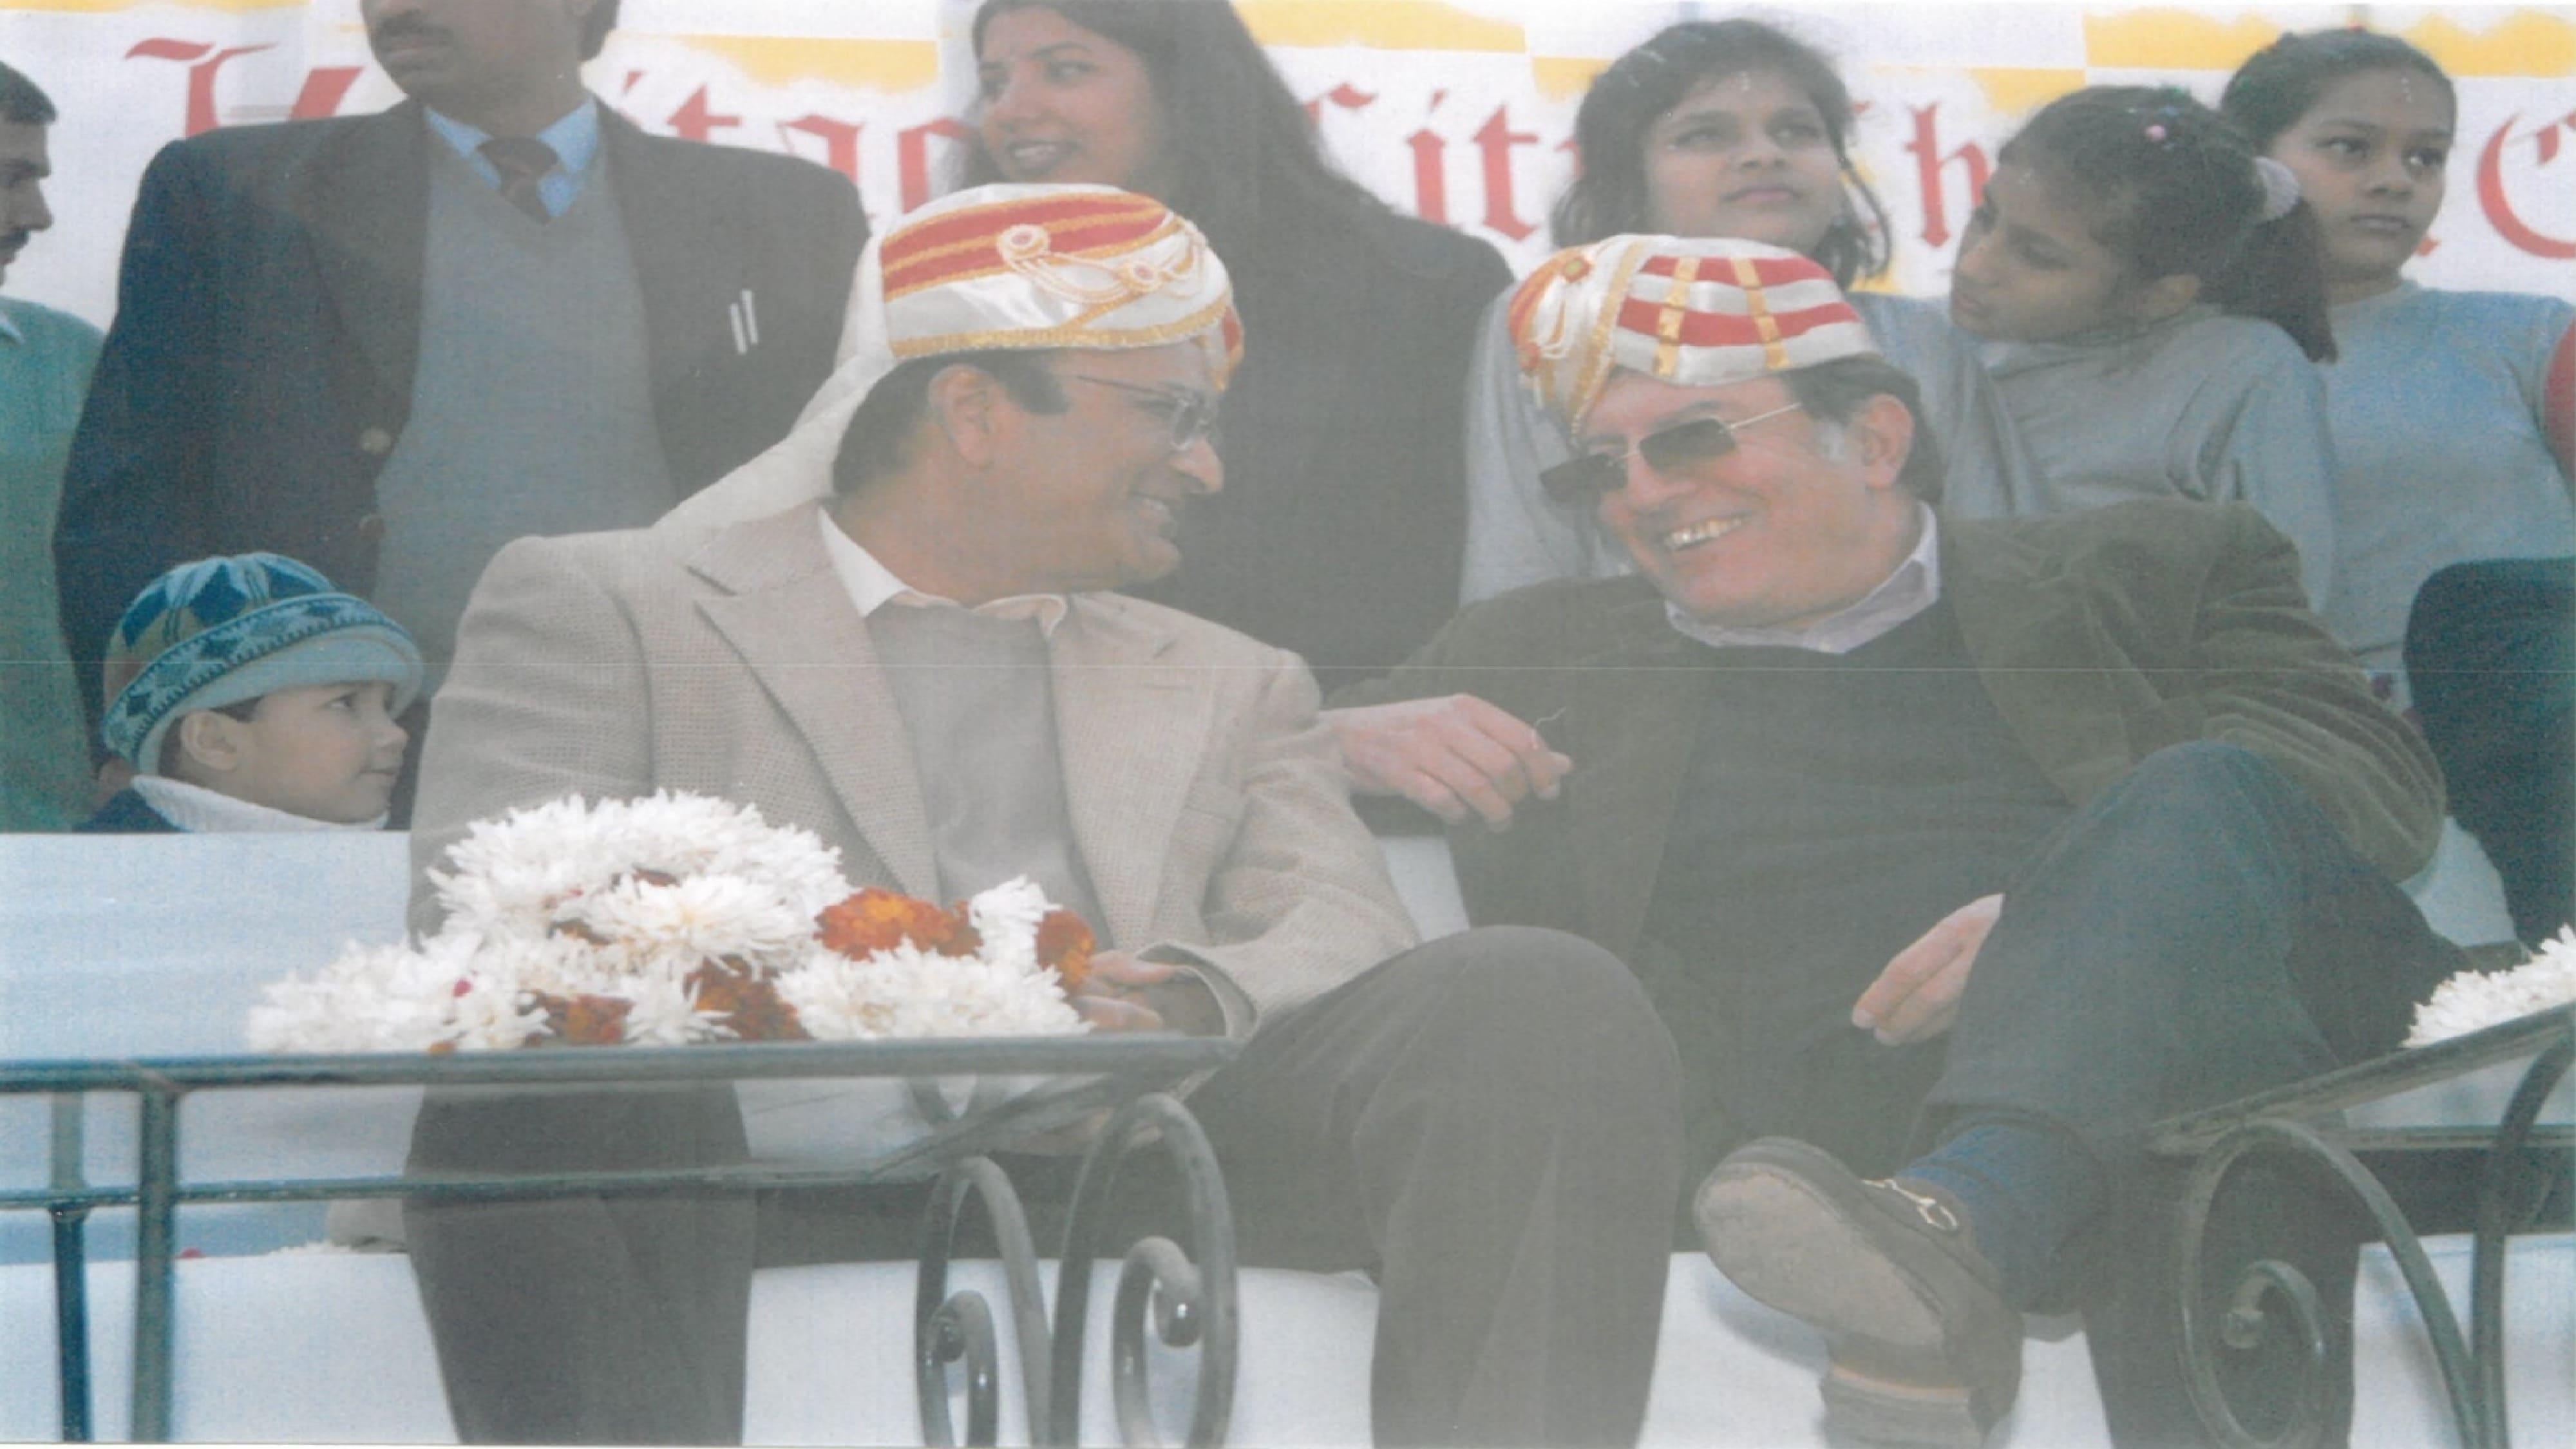 Nawab Pataudi Ji sharing a grin with Dr. Raghupati Singhania.